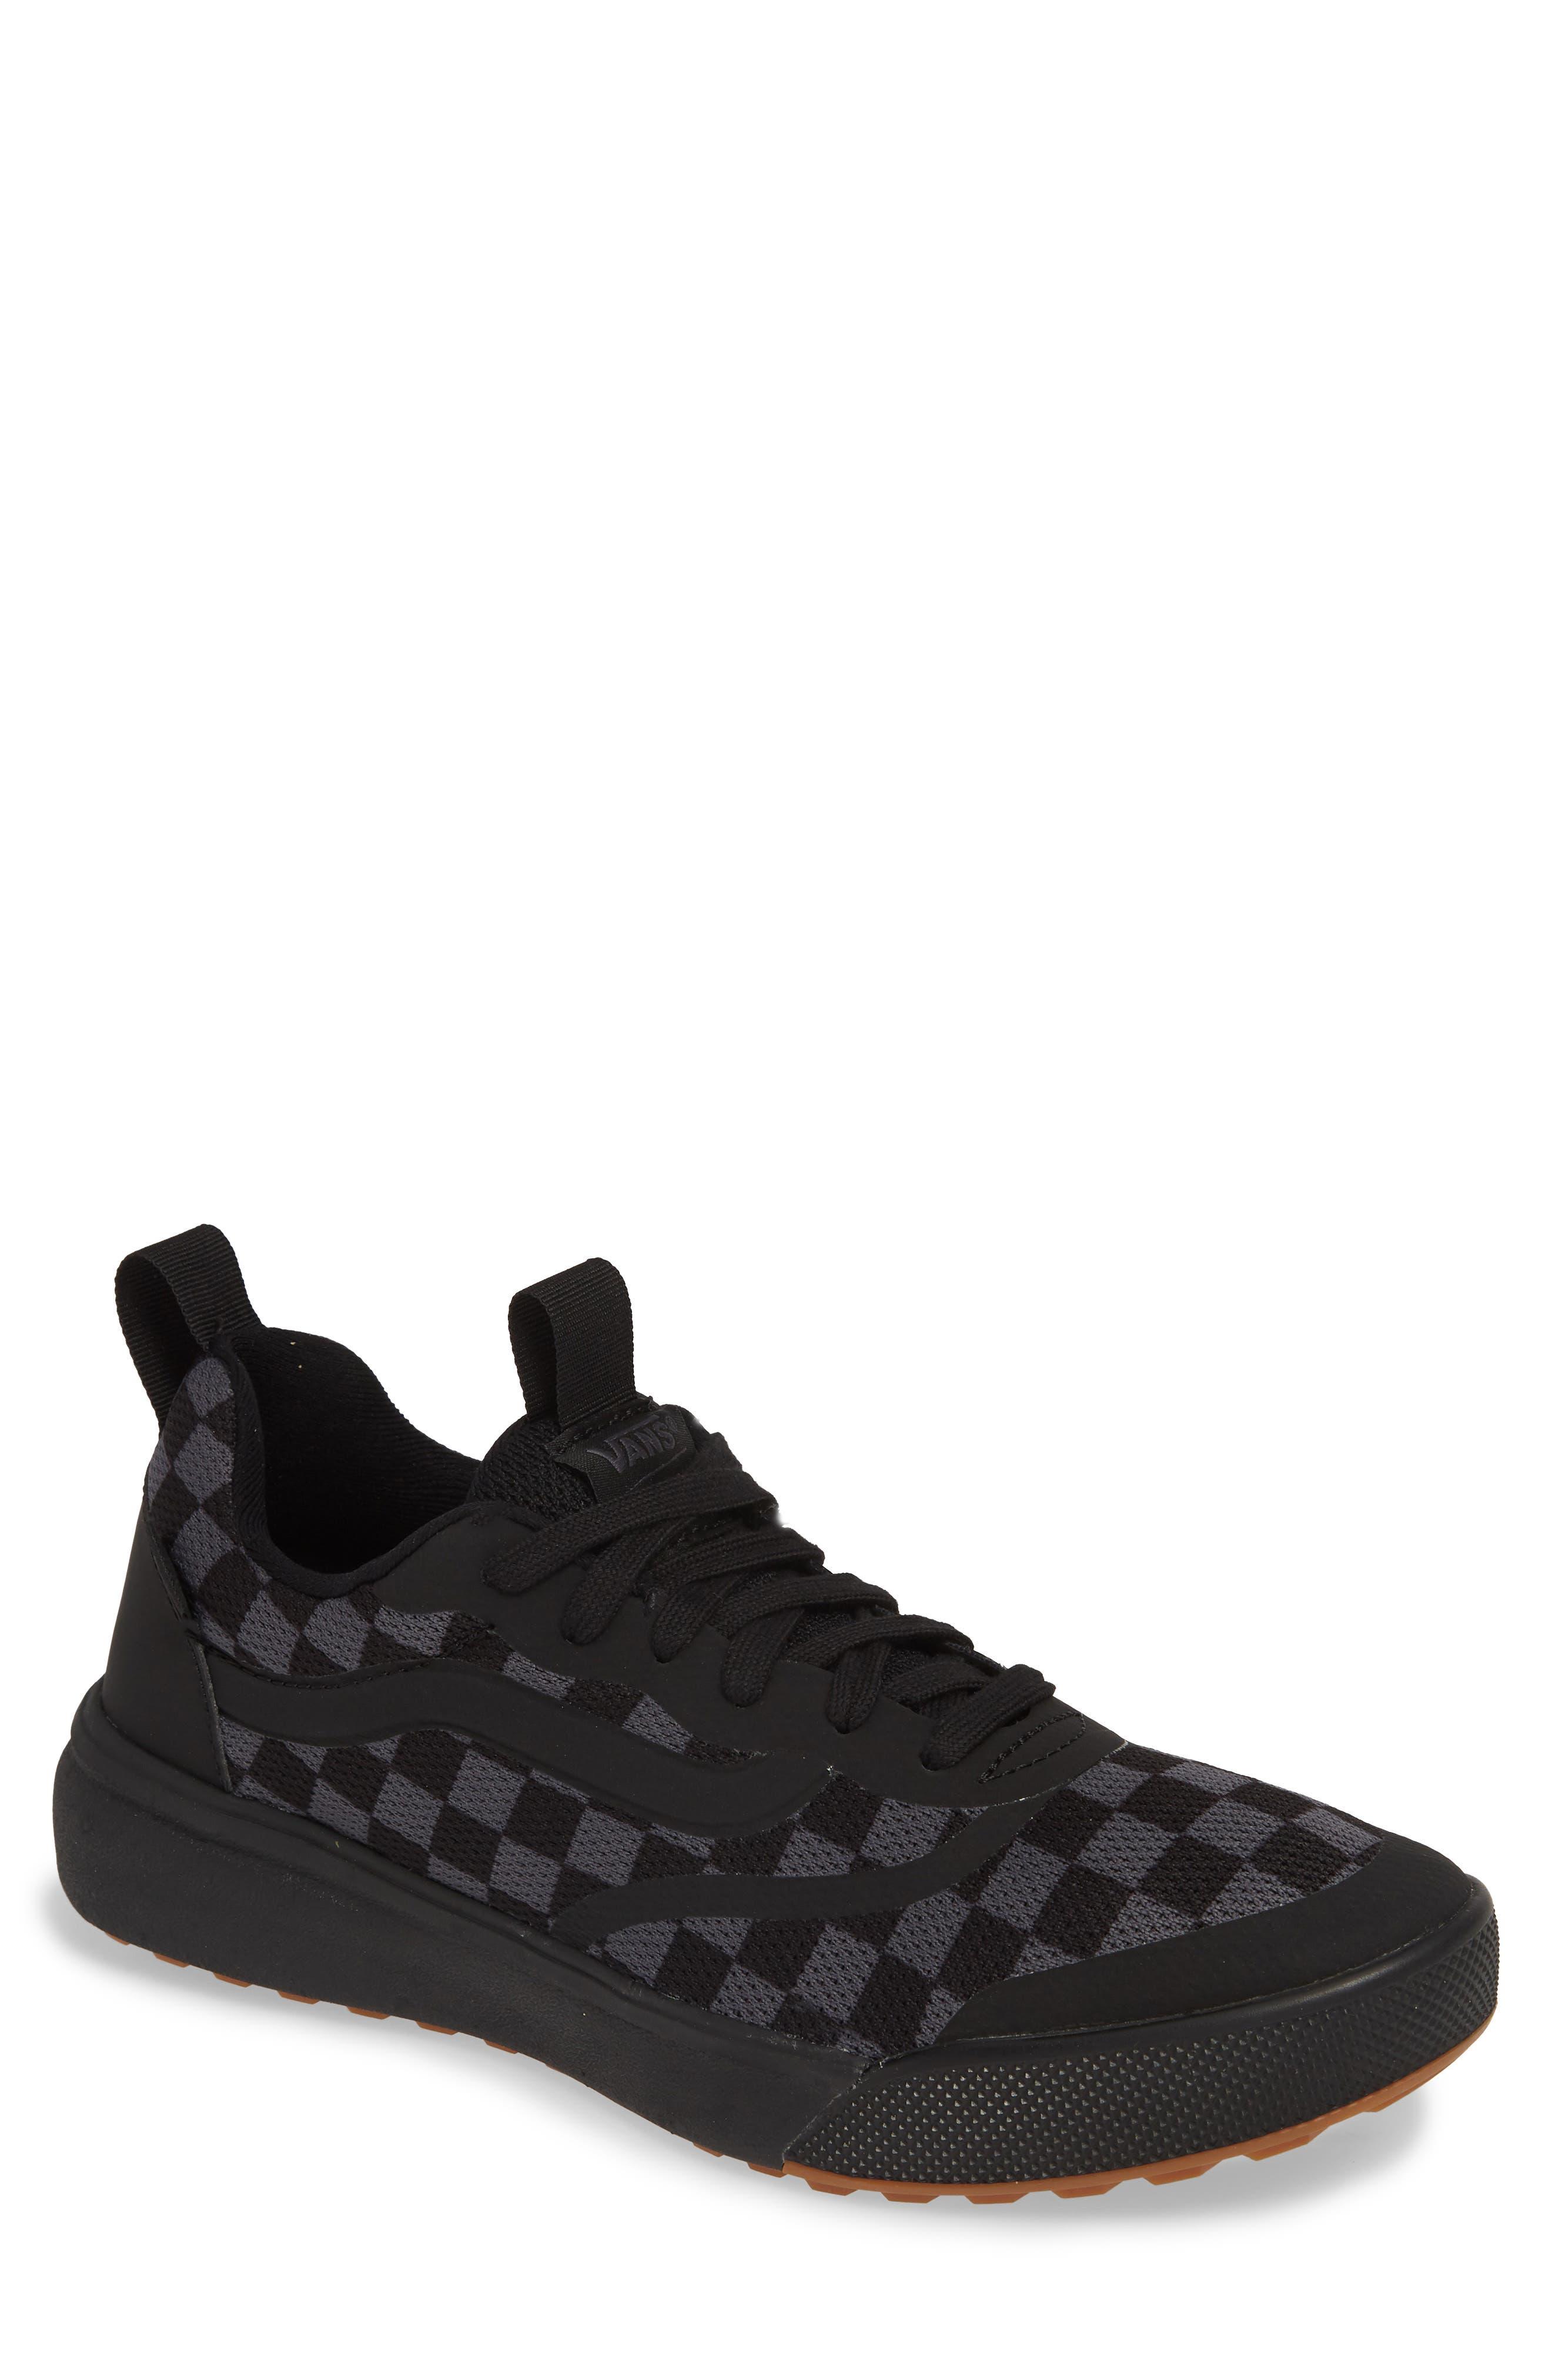 VANS UltraRange Rapidwield Sneaker, Main, color, 003